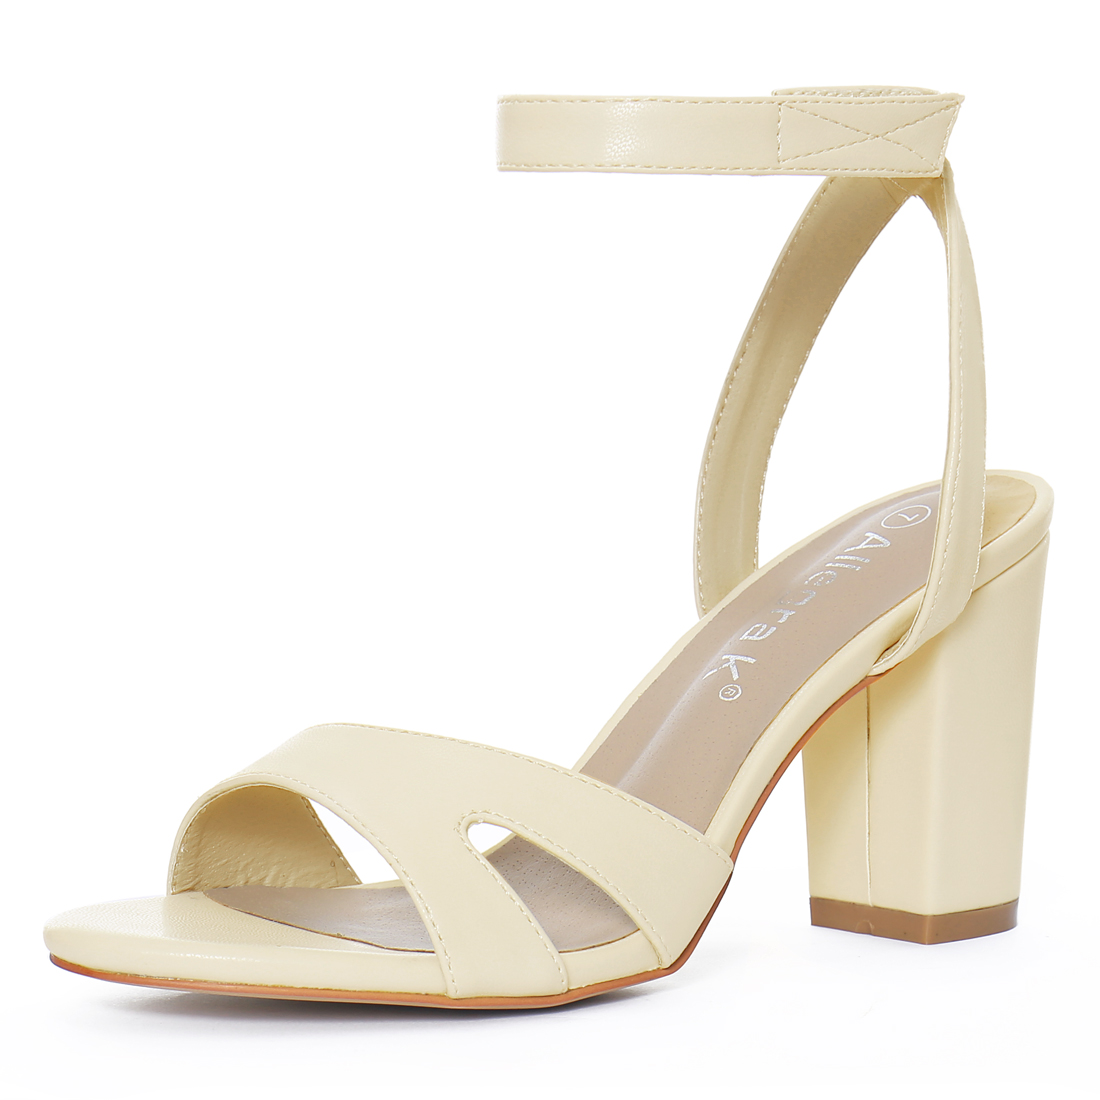 Women Open Toe Block High Heels Ankle Strap Sandals Off White US 6